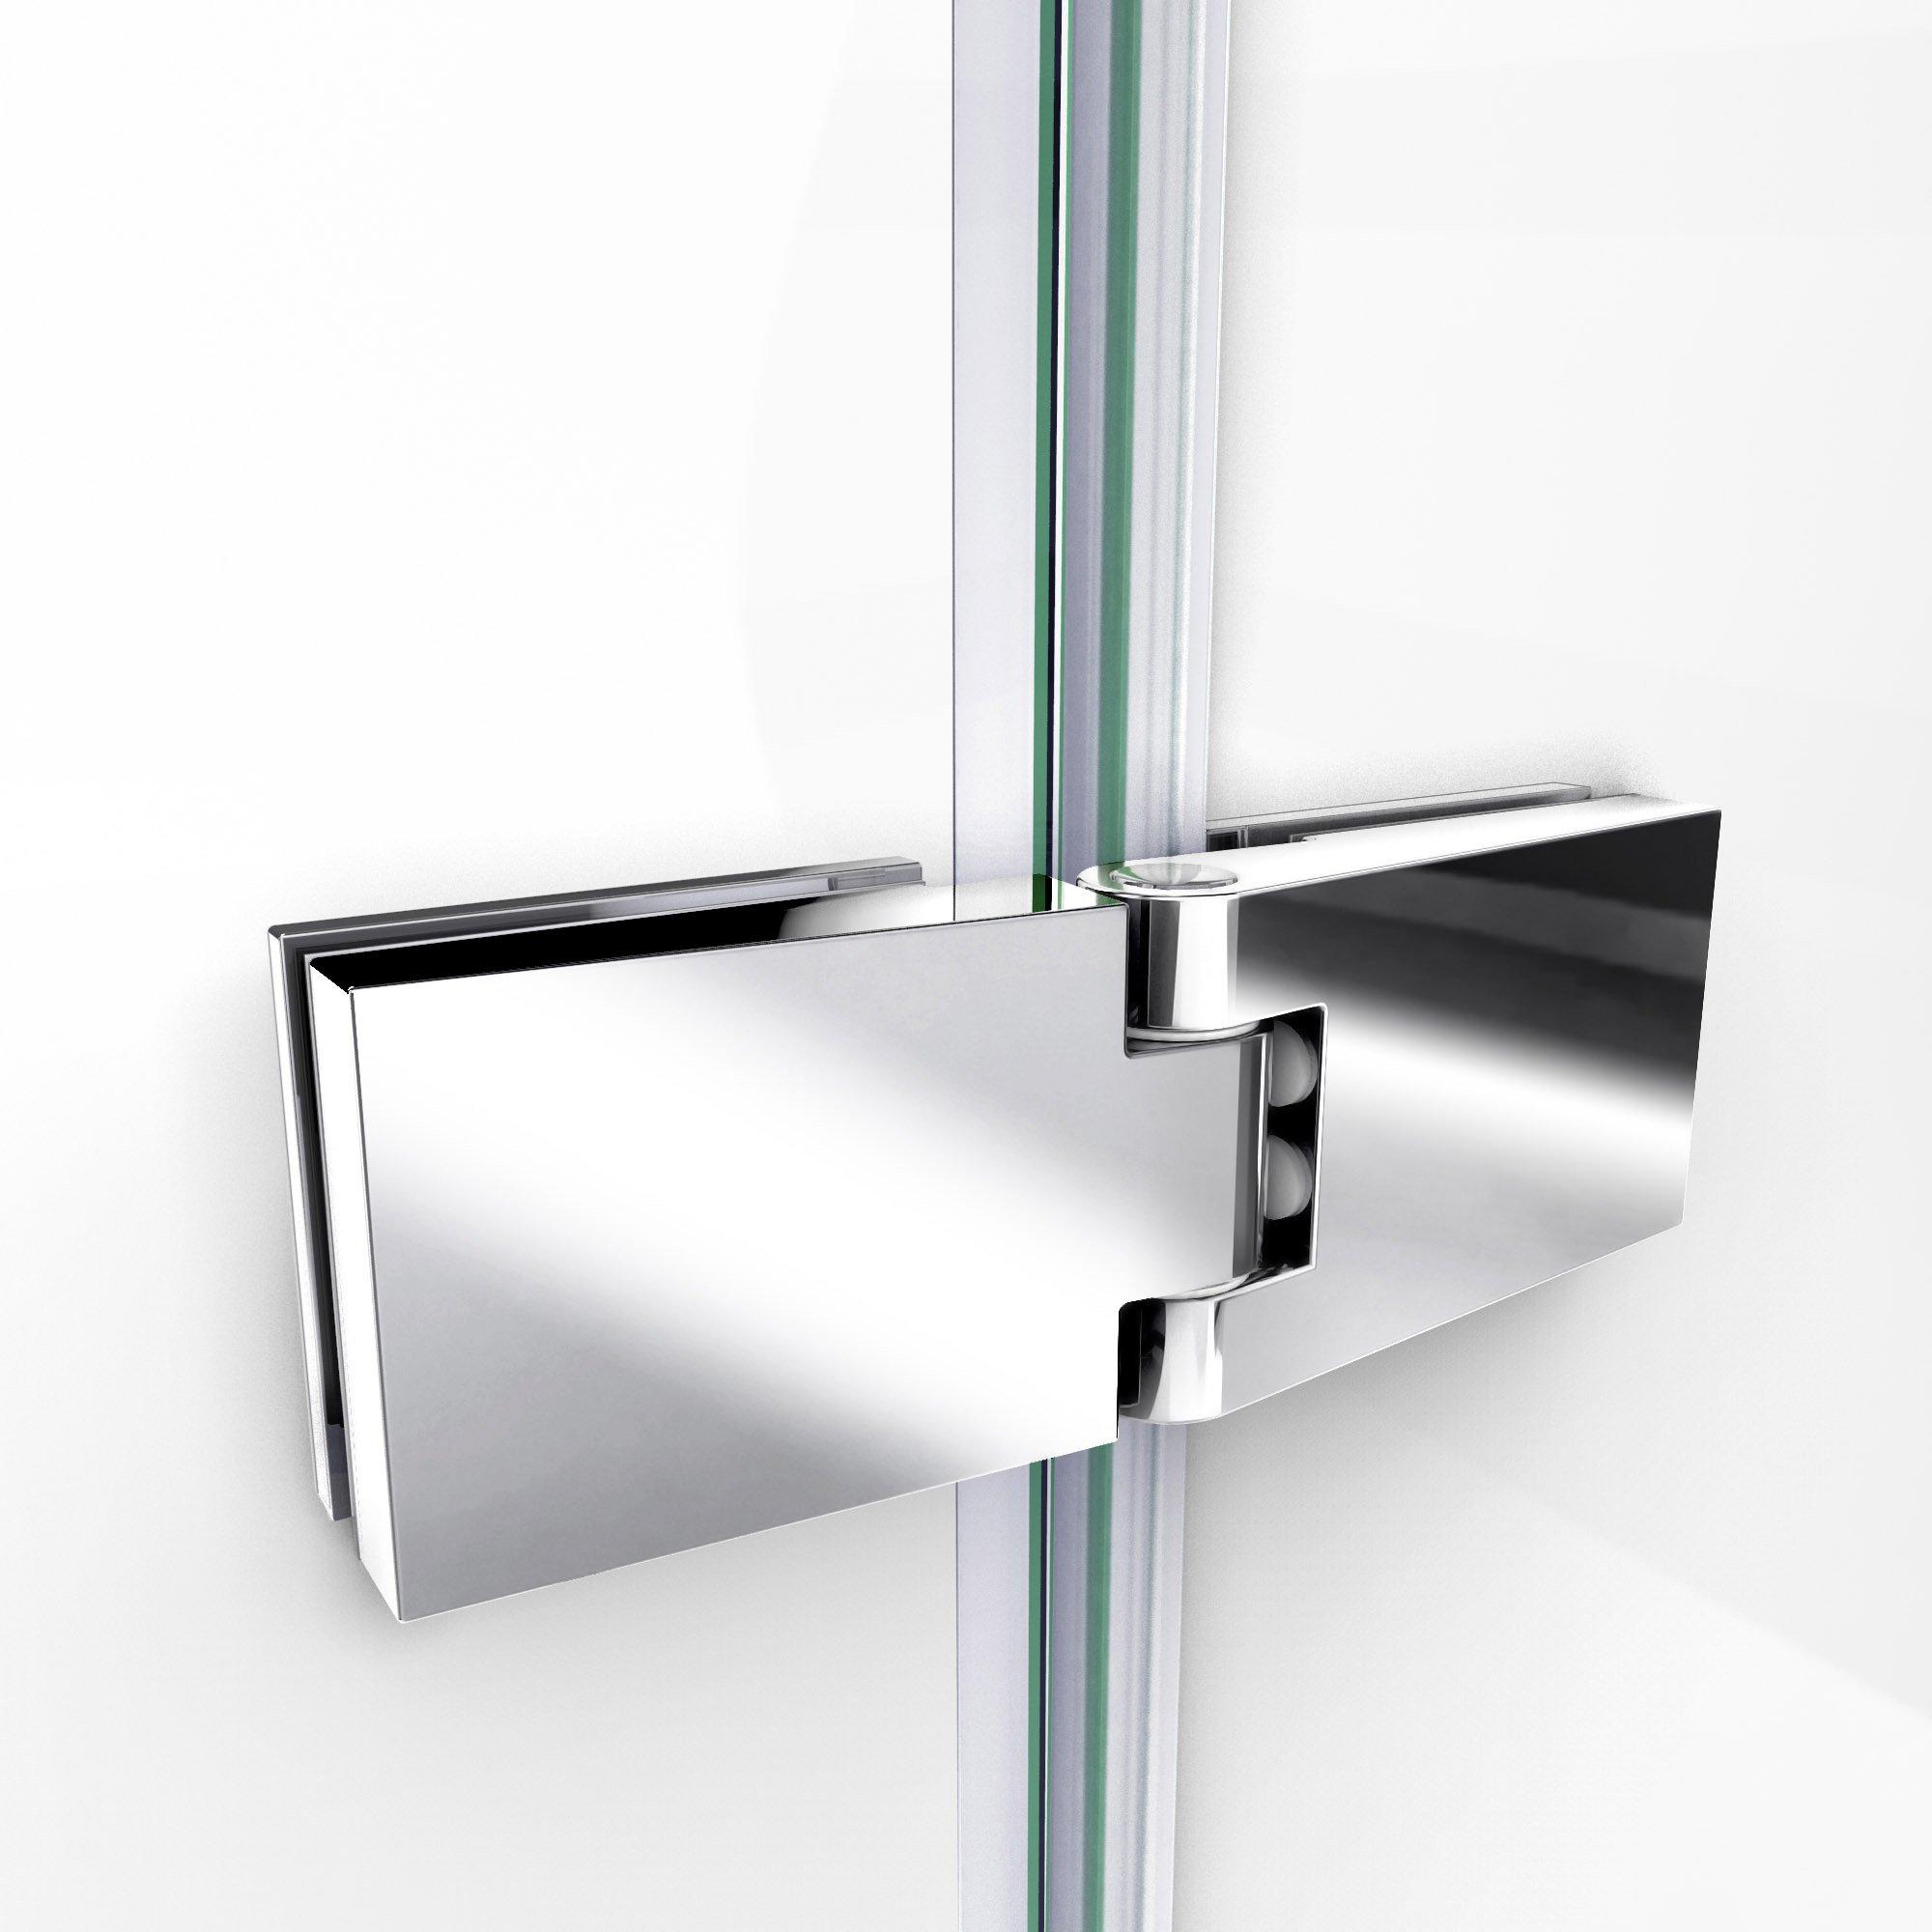 DreamLine Aqua Ultra 45 in. W x 72 in. H Frameless Hinged Shower Door in Brushed Nickel, SHDR-3445720-04 by DreamLine (Image #7)